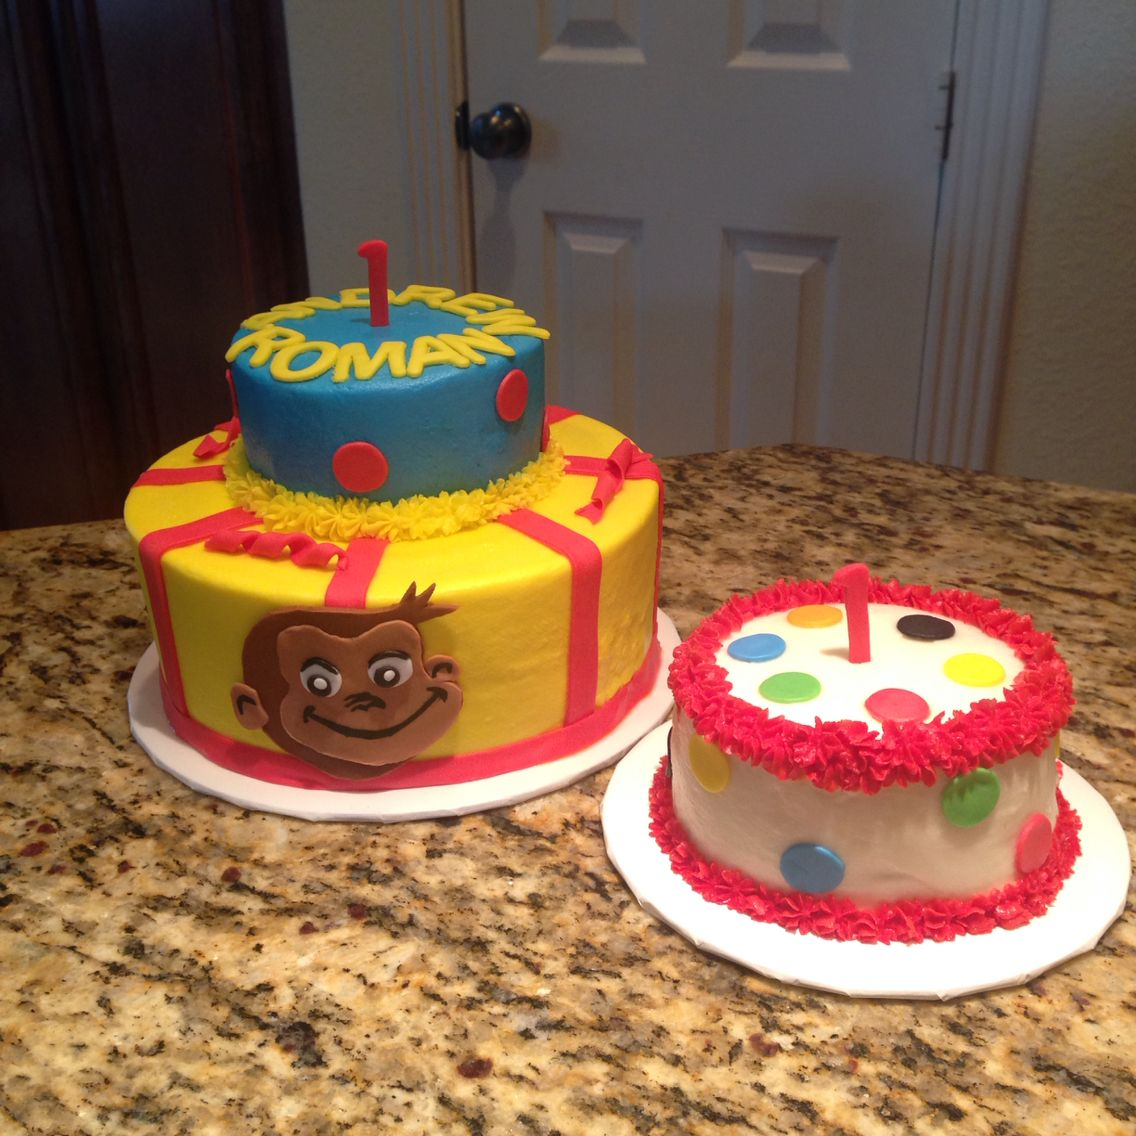 Curious George first birthday cake and matching polka dots smash cake. https://m.facebook.com/sweetnsassycakesbyeva